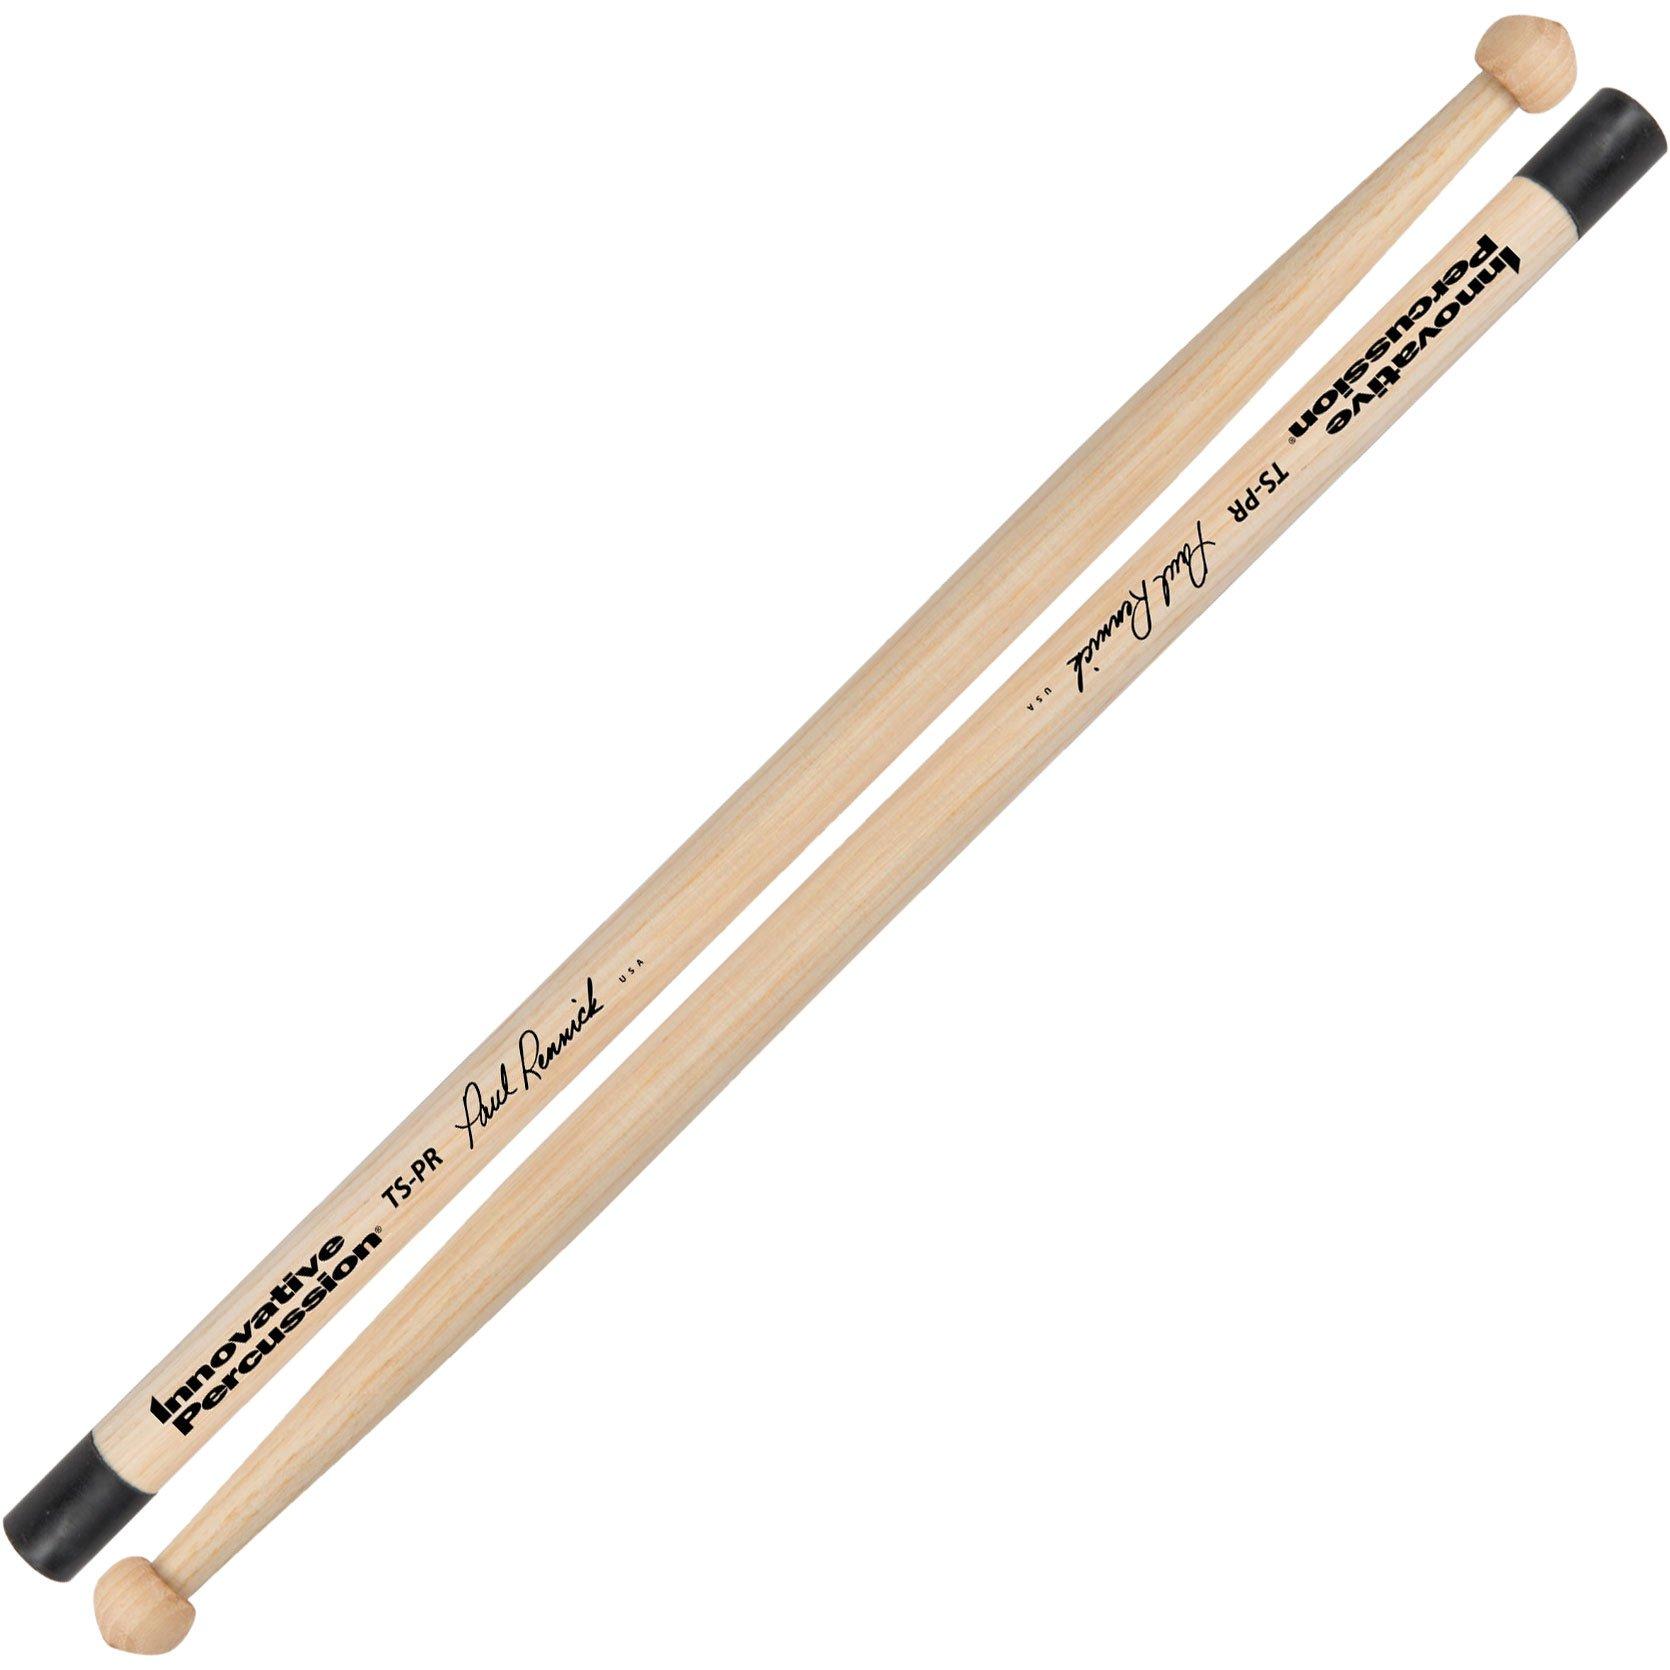 Innovative Percussion TS-PR Paul Rennick Multi-Stick